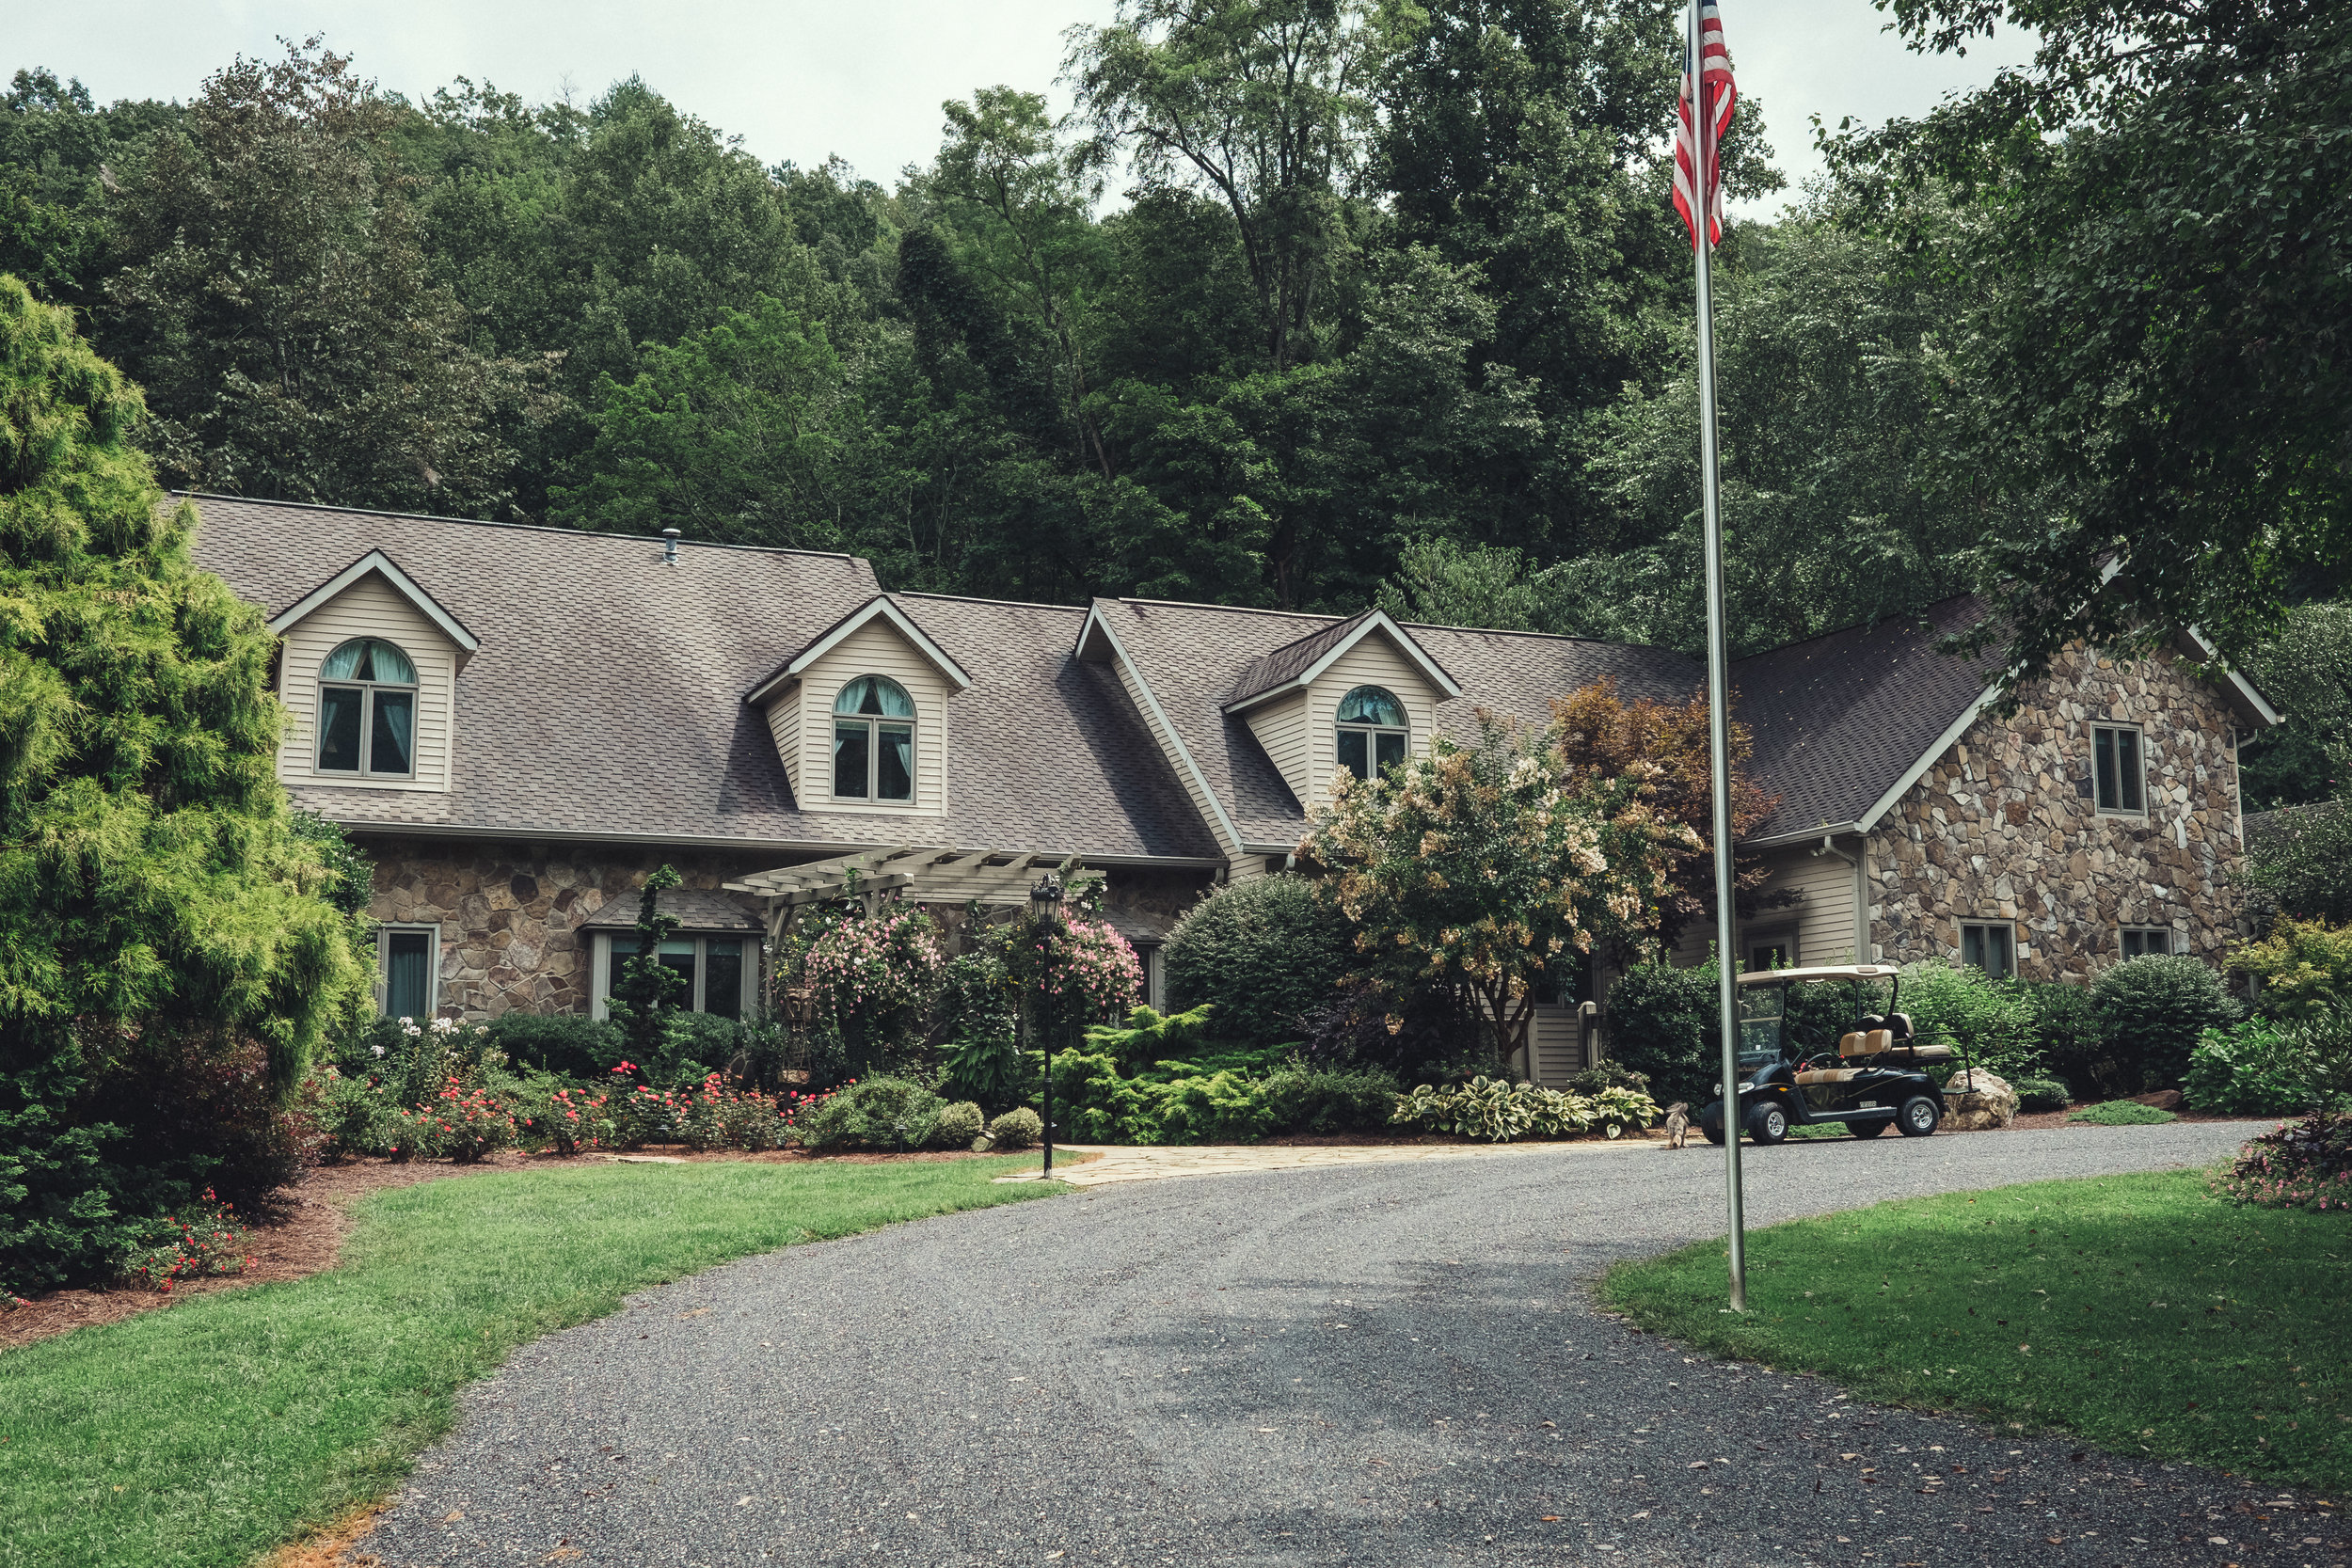 Main house at Hawkesdene